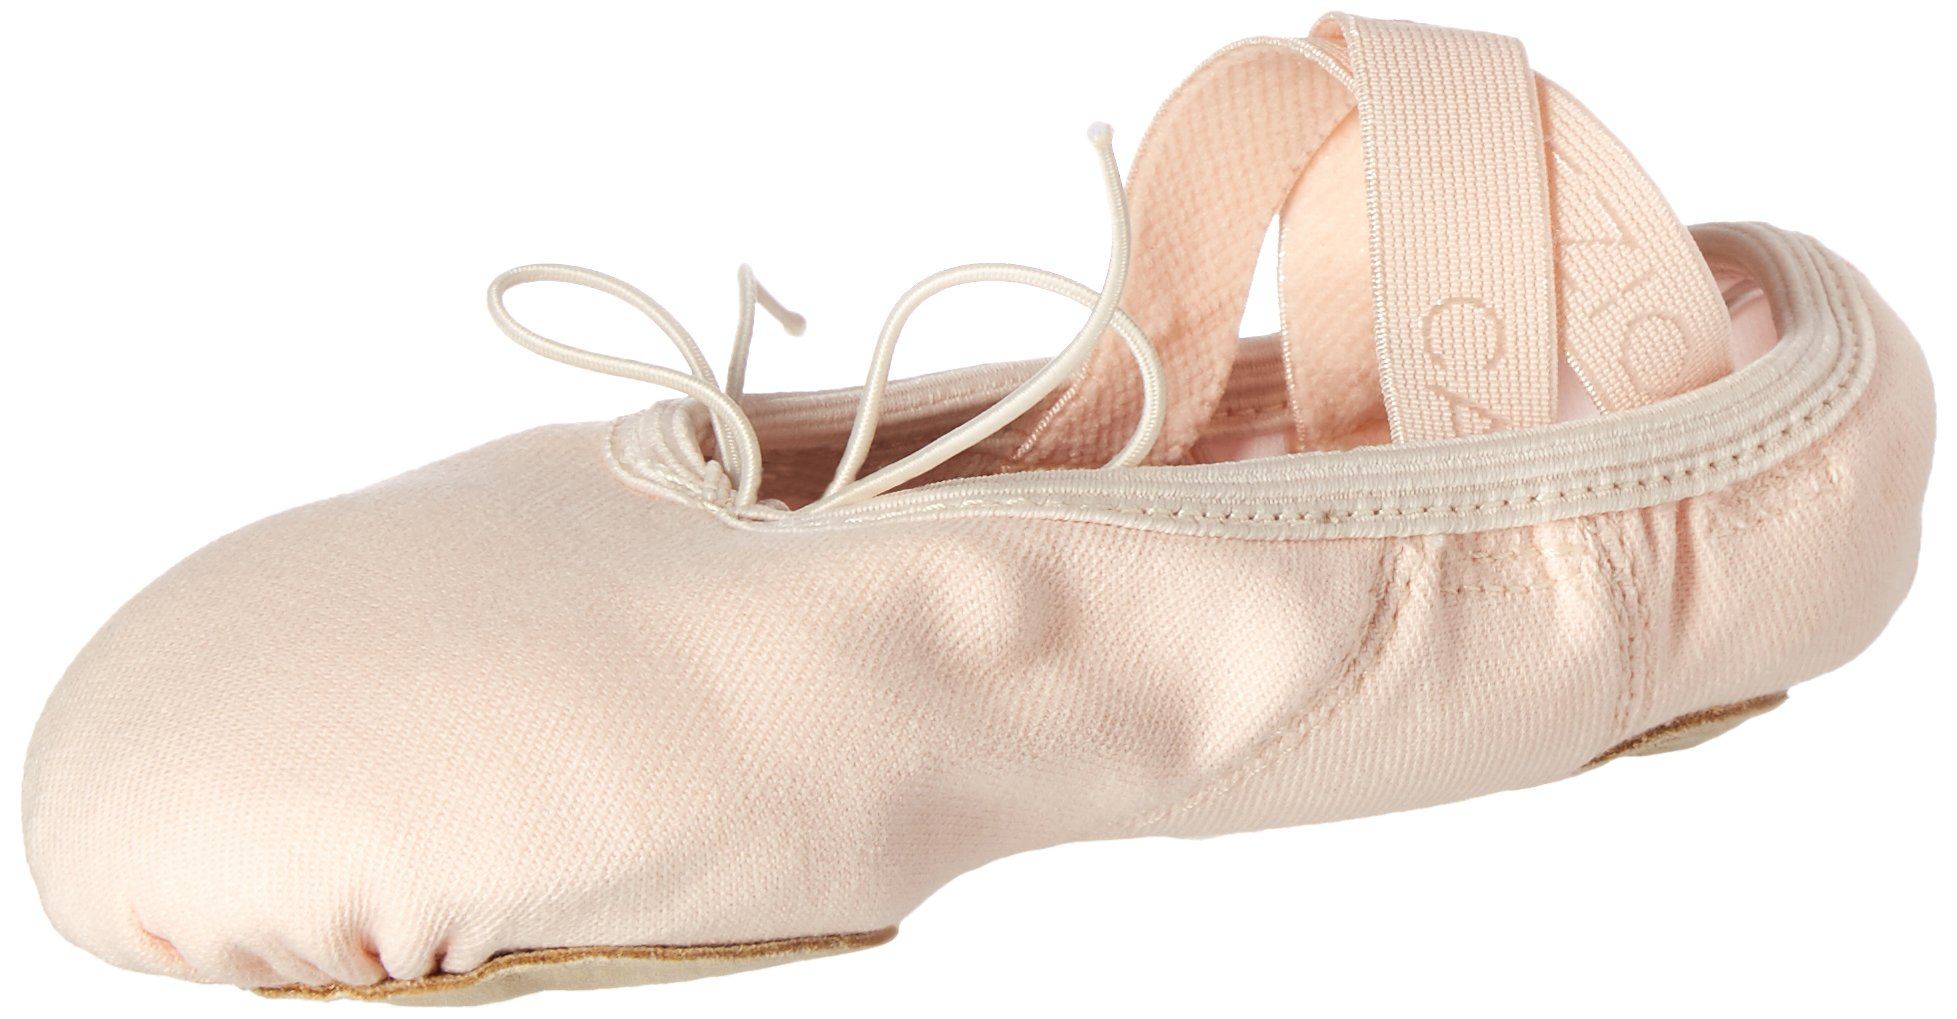 Capezio Women's Sculpture Ii Dance Shoe, Pro Pink, 7 W US